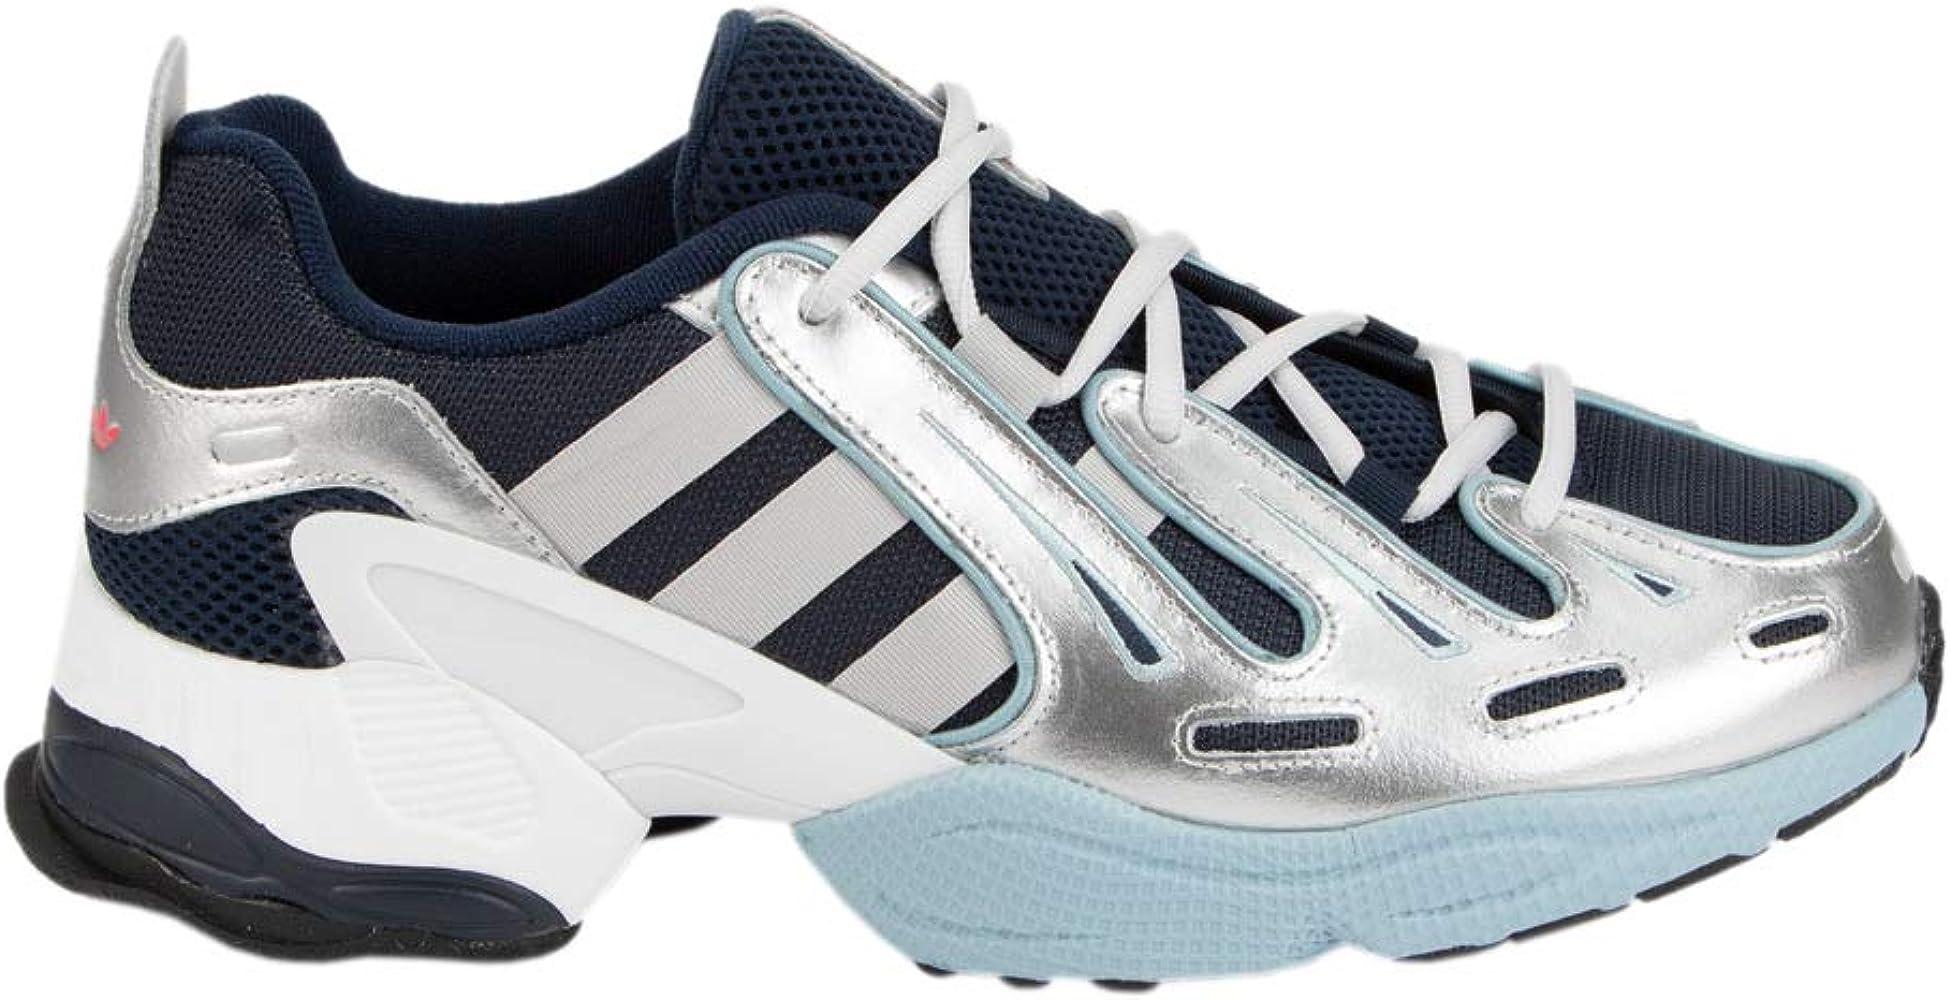 Amazon.com: adidas EQT Gazelle: Shoes